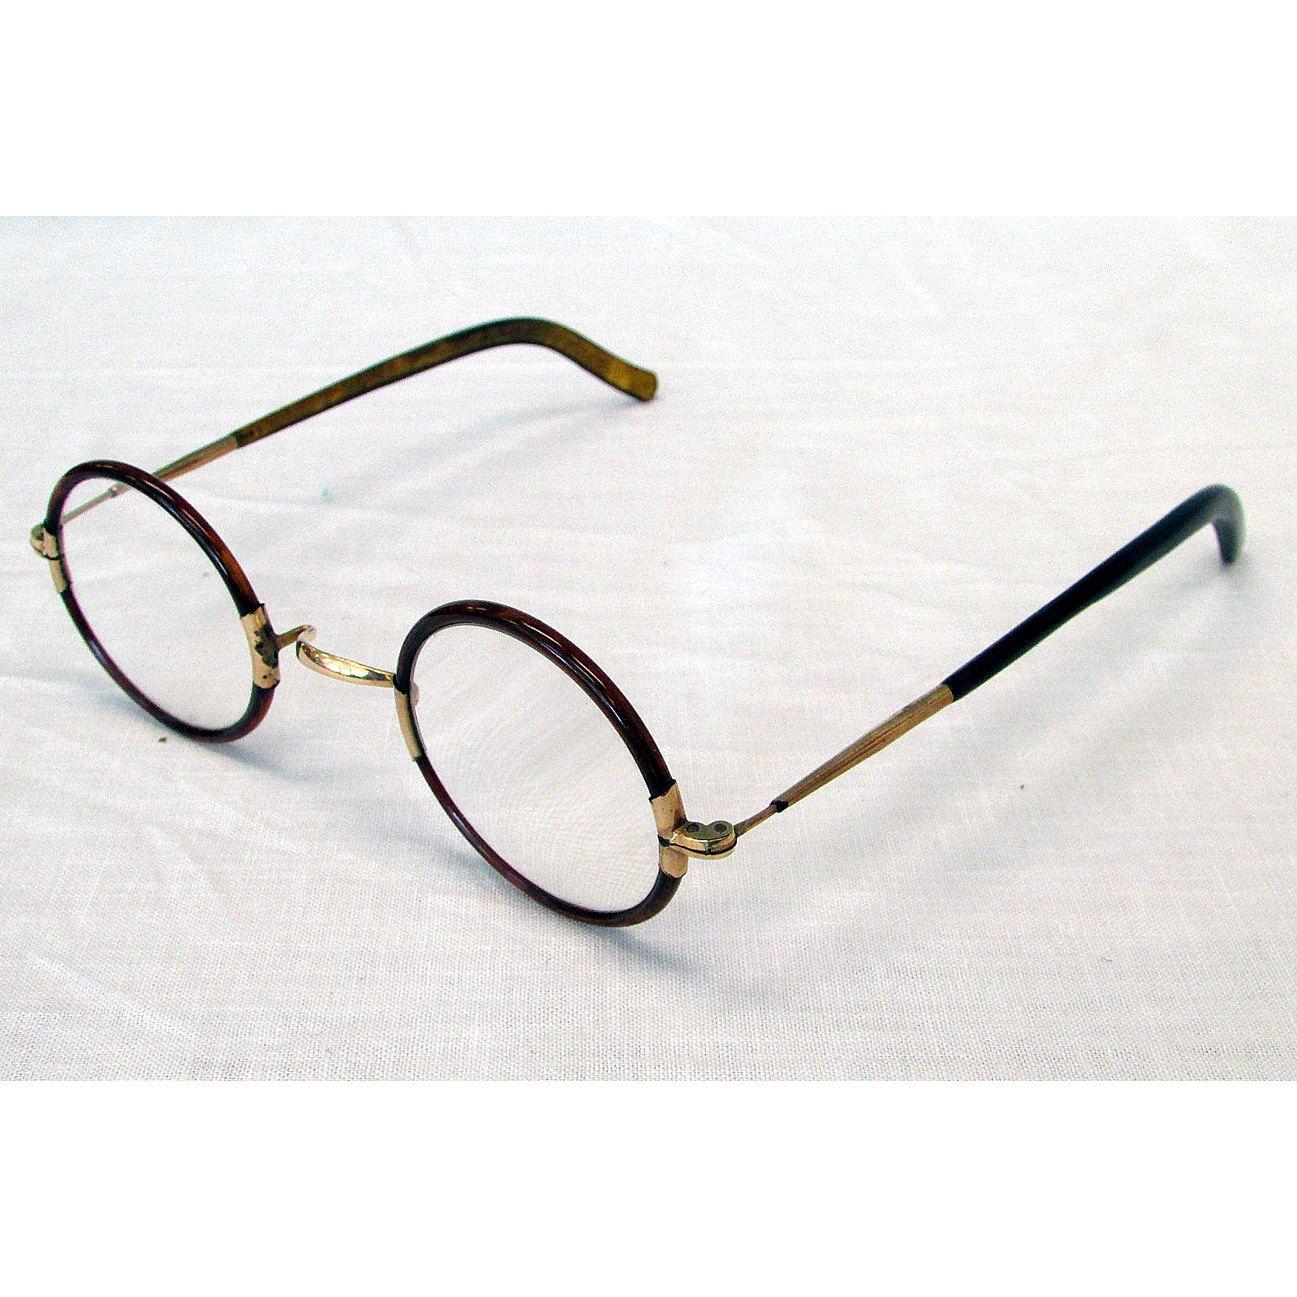 2cf2054a7127 Windsor Style Harold Lloyd Horn Rim Round 1912 Antique Eyeglasses Tortoise  - pinned by pin4etsy.com